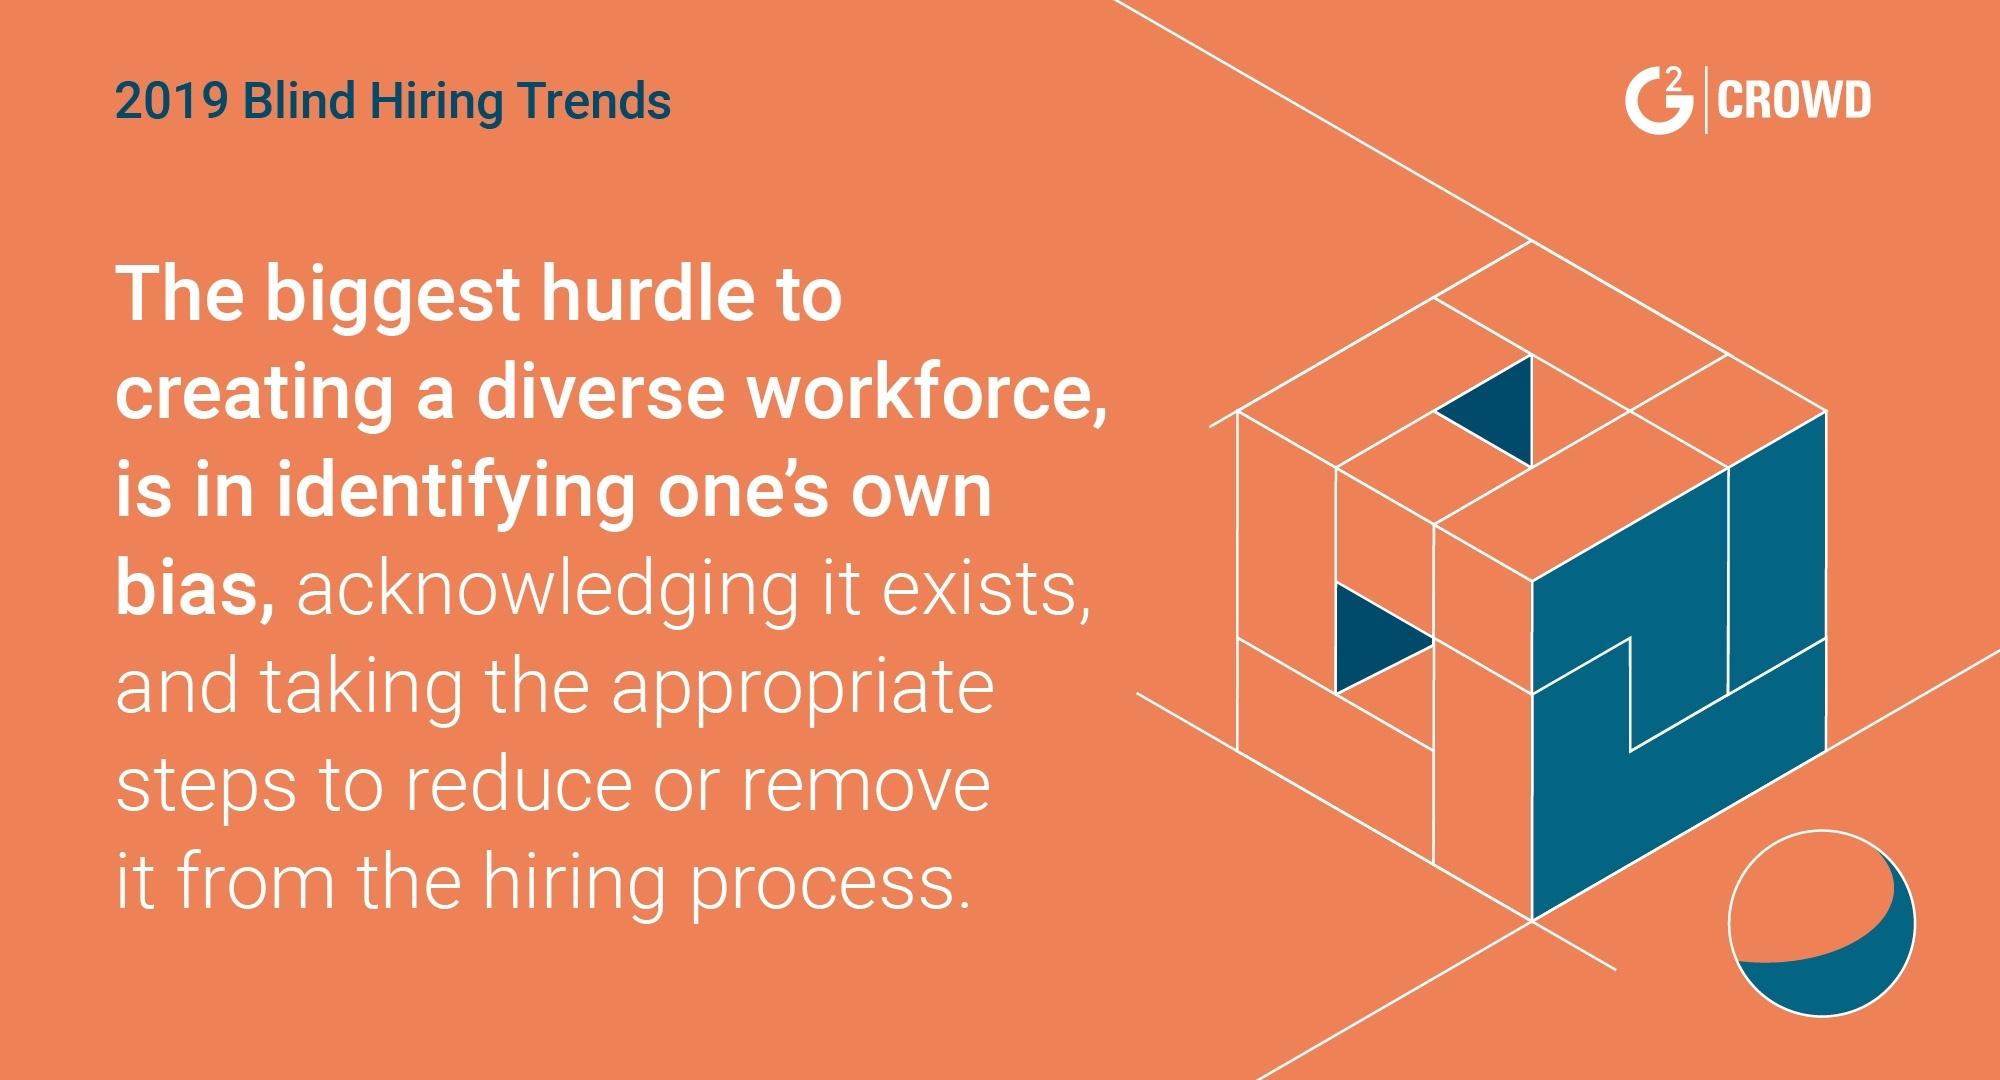 blind-hiring-trends-for-2019